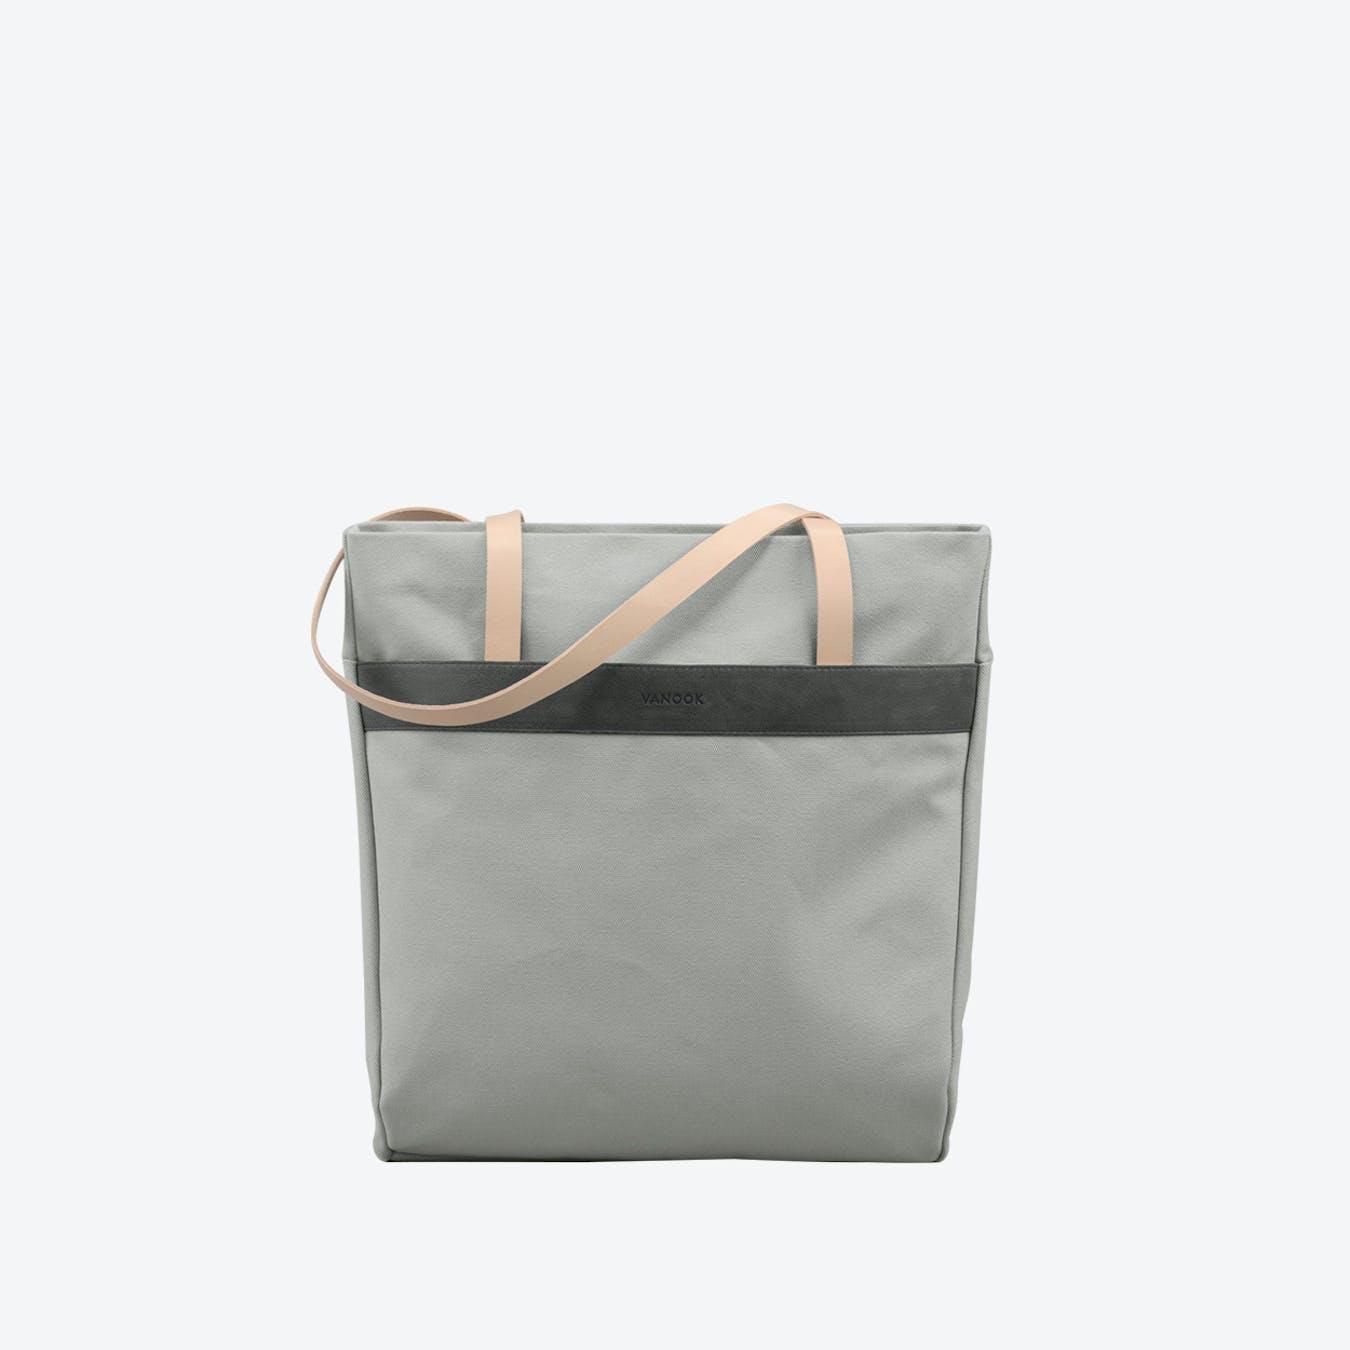 Shopper Bag in Grey Nude